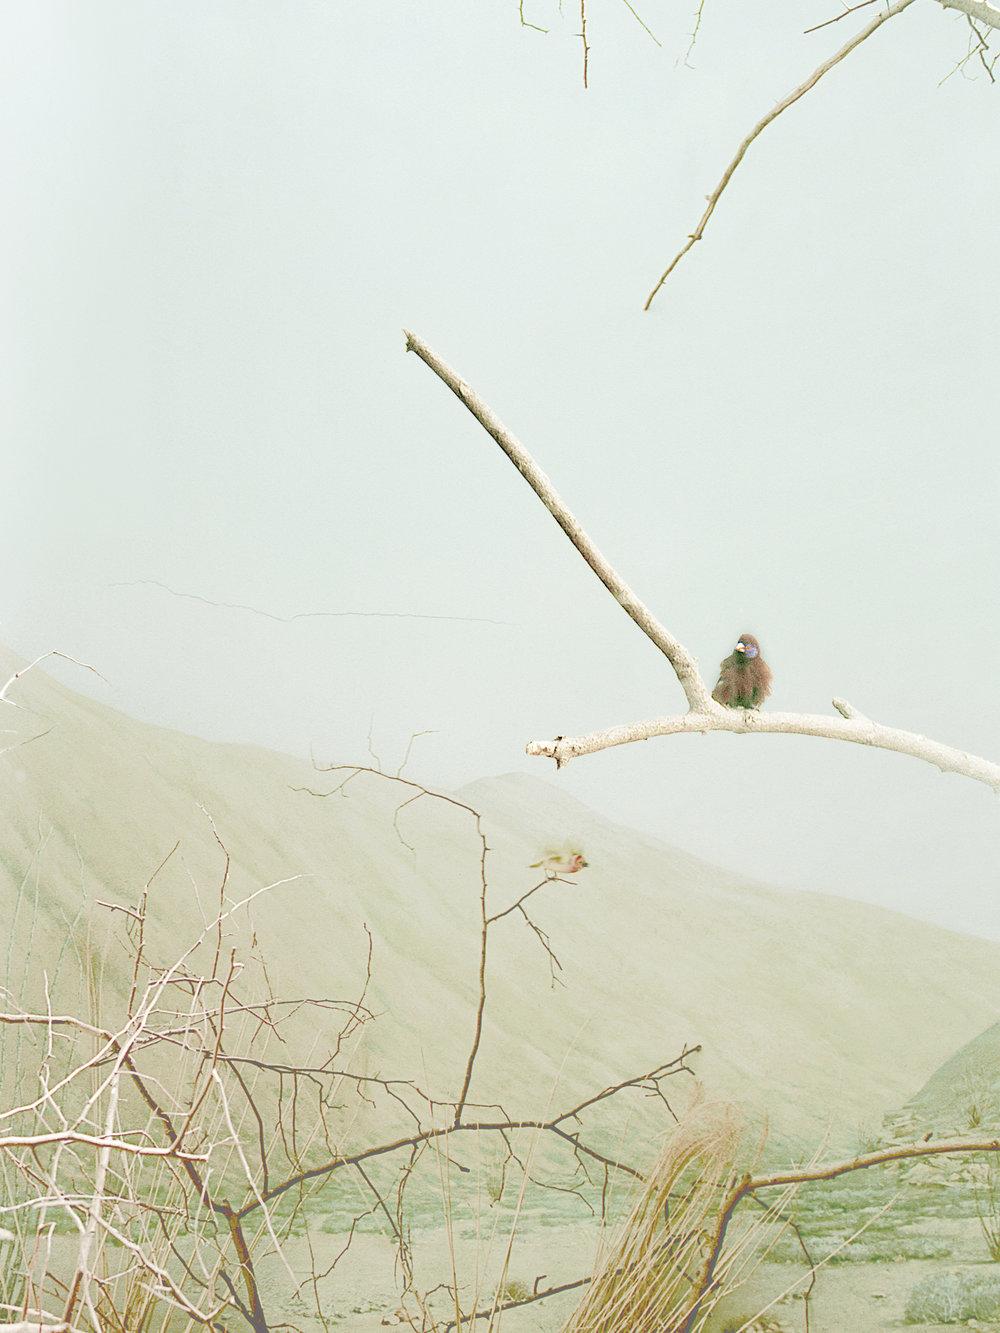 ZOO_oiseau2_1©AudeSIRVAIN.jpg